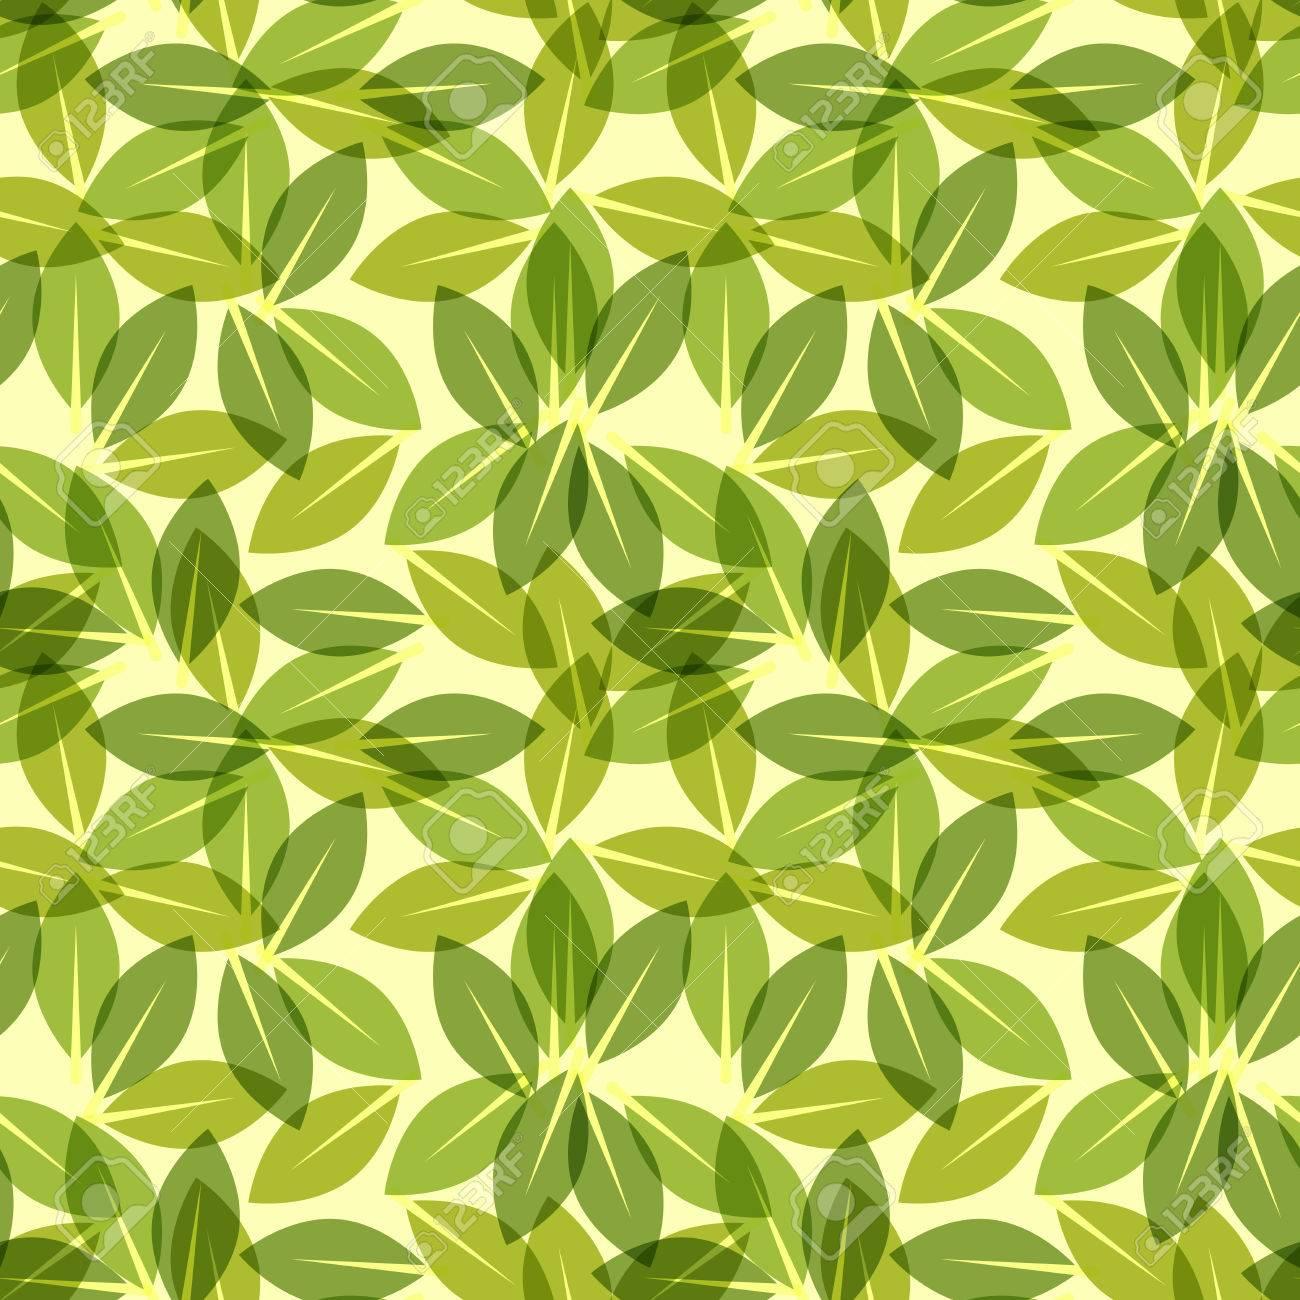 Green Leaf Spring Wallpaper Elegant Fresh Foliage Or Greenery Stock Vector